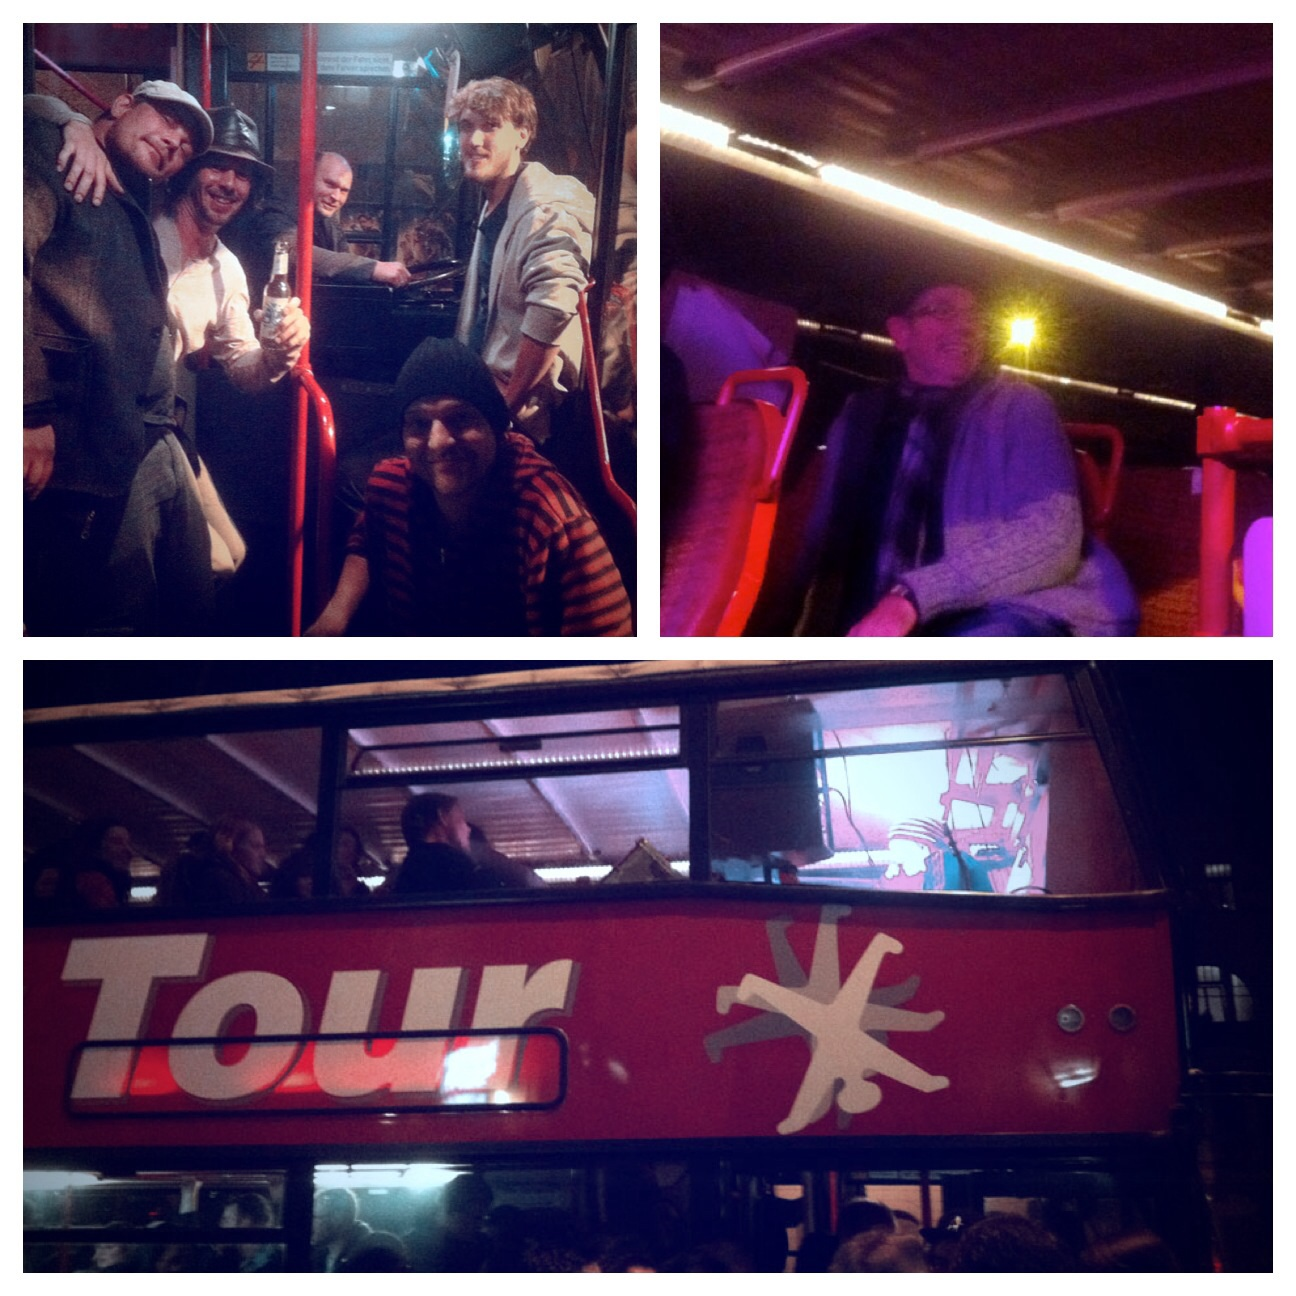 Kai Uwe Kolkhorst, One Take Toni, Ehrenfeld Hopping, Shuttlebus Party, Mühlenkölsch, Köln